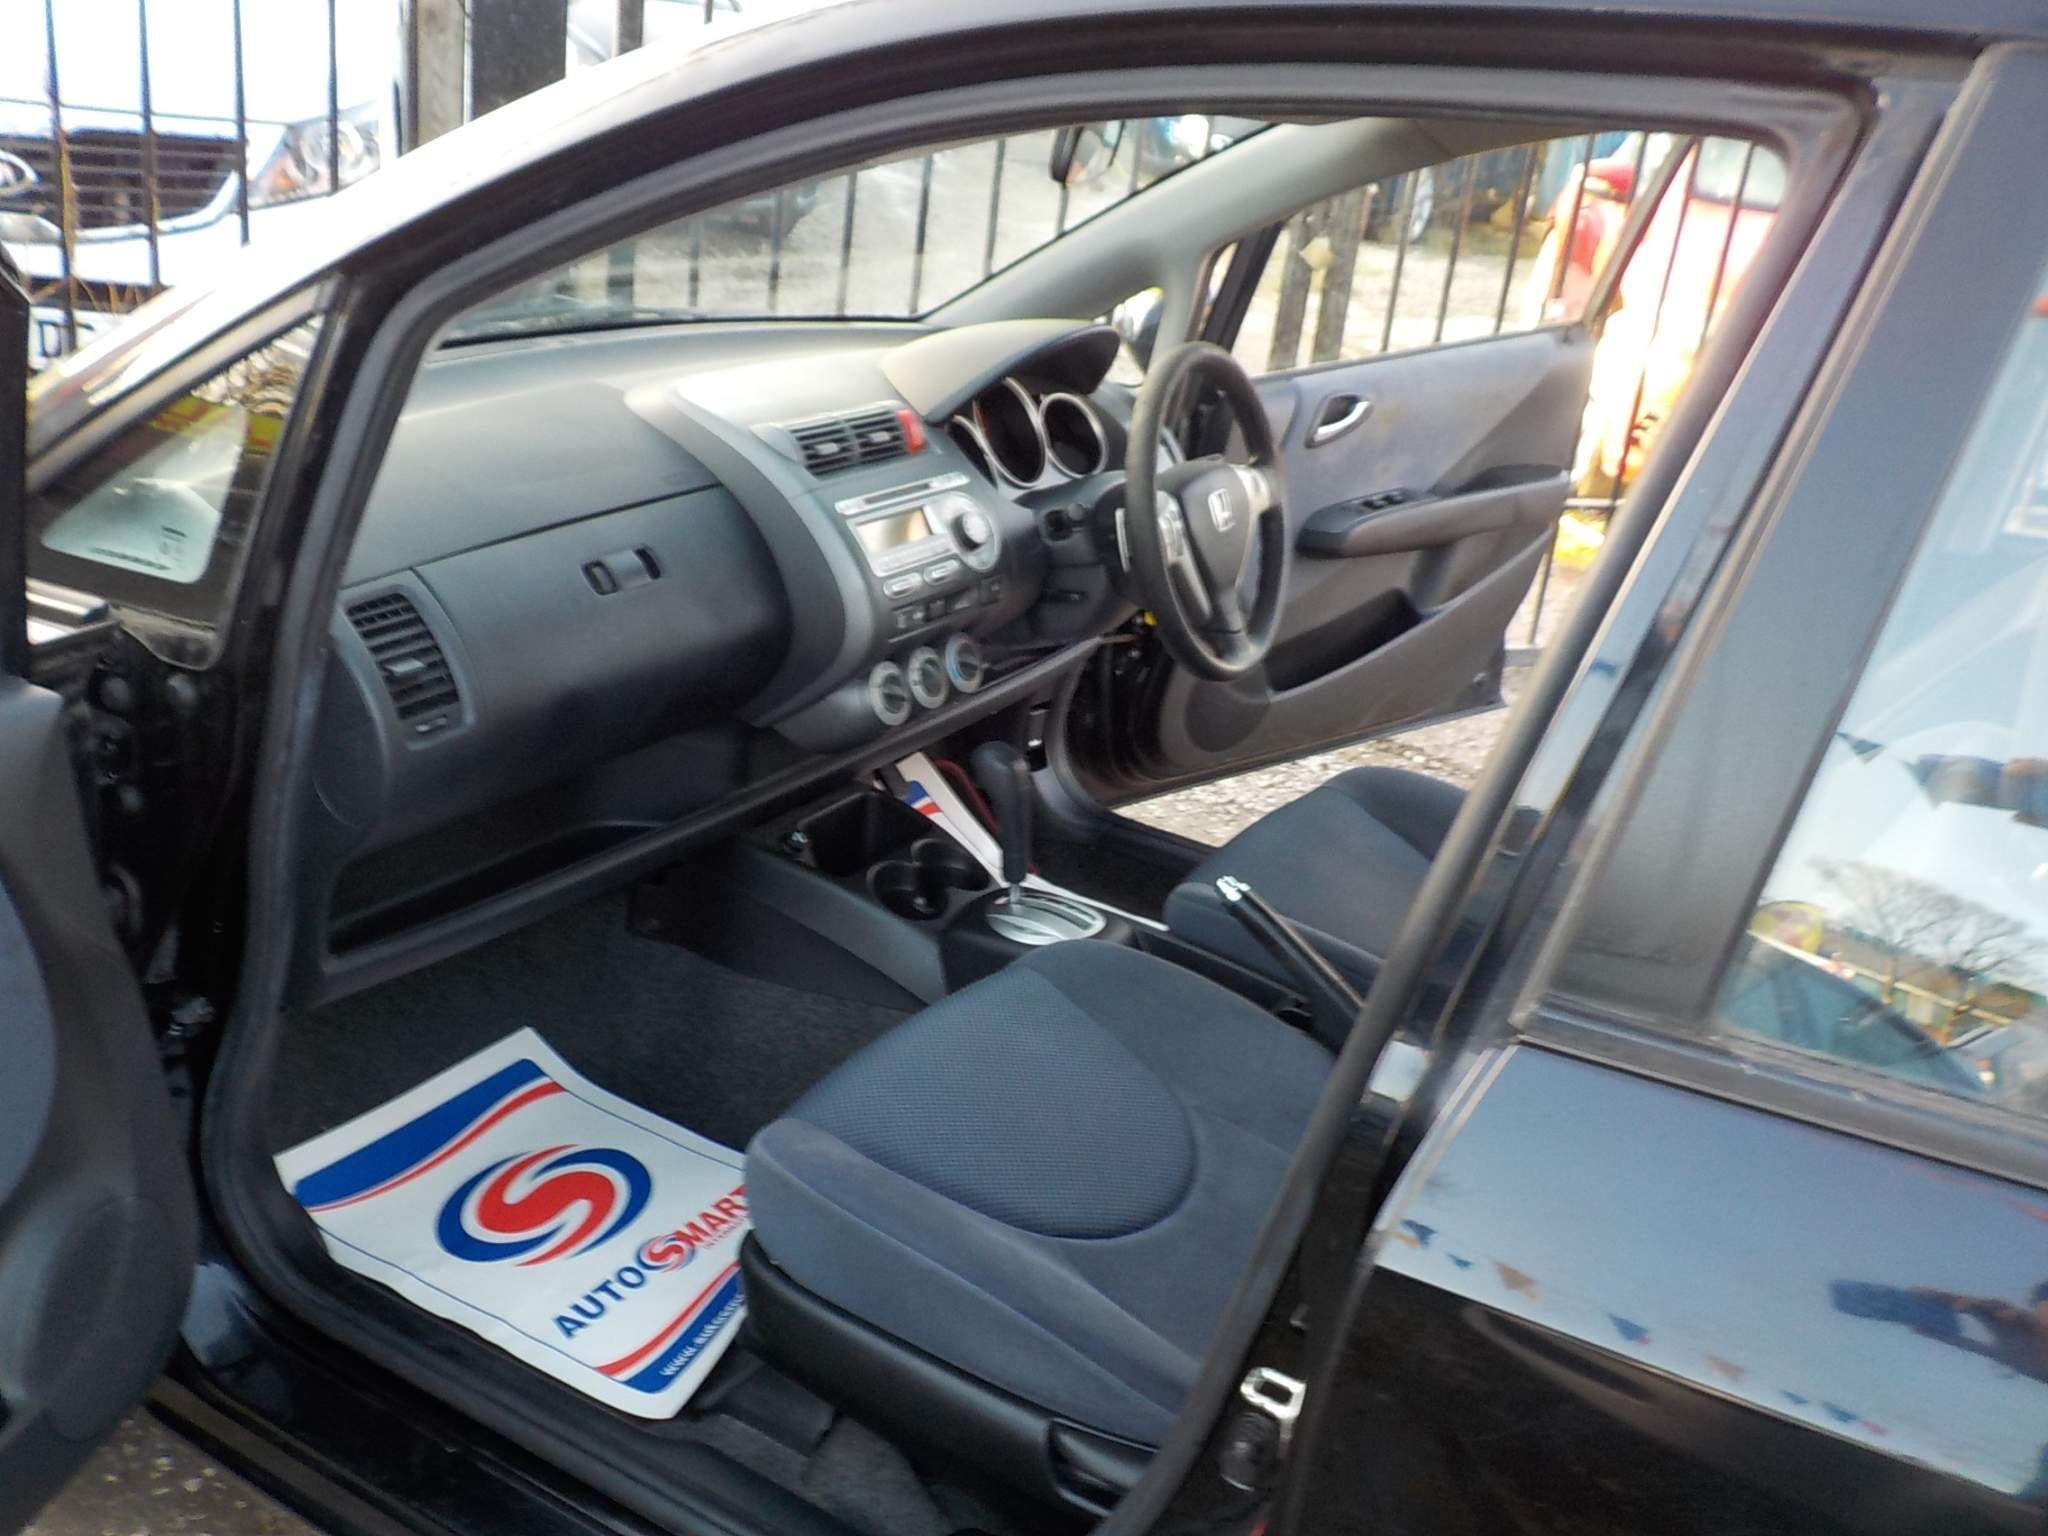 Honda Jazz 1.4 i-DSI SE CVT-7 5dr